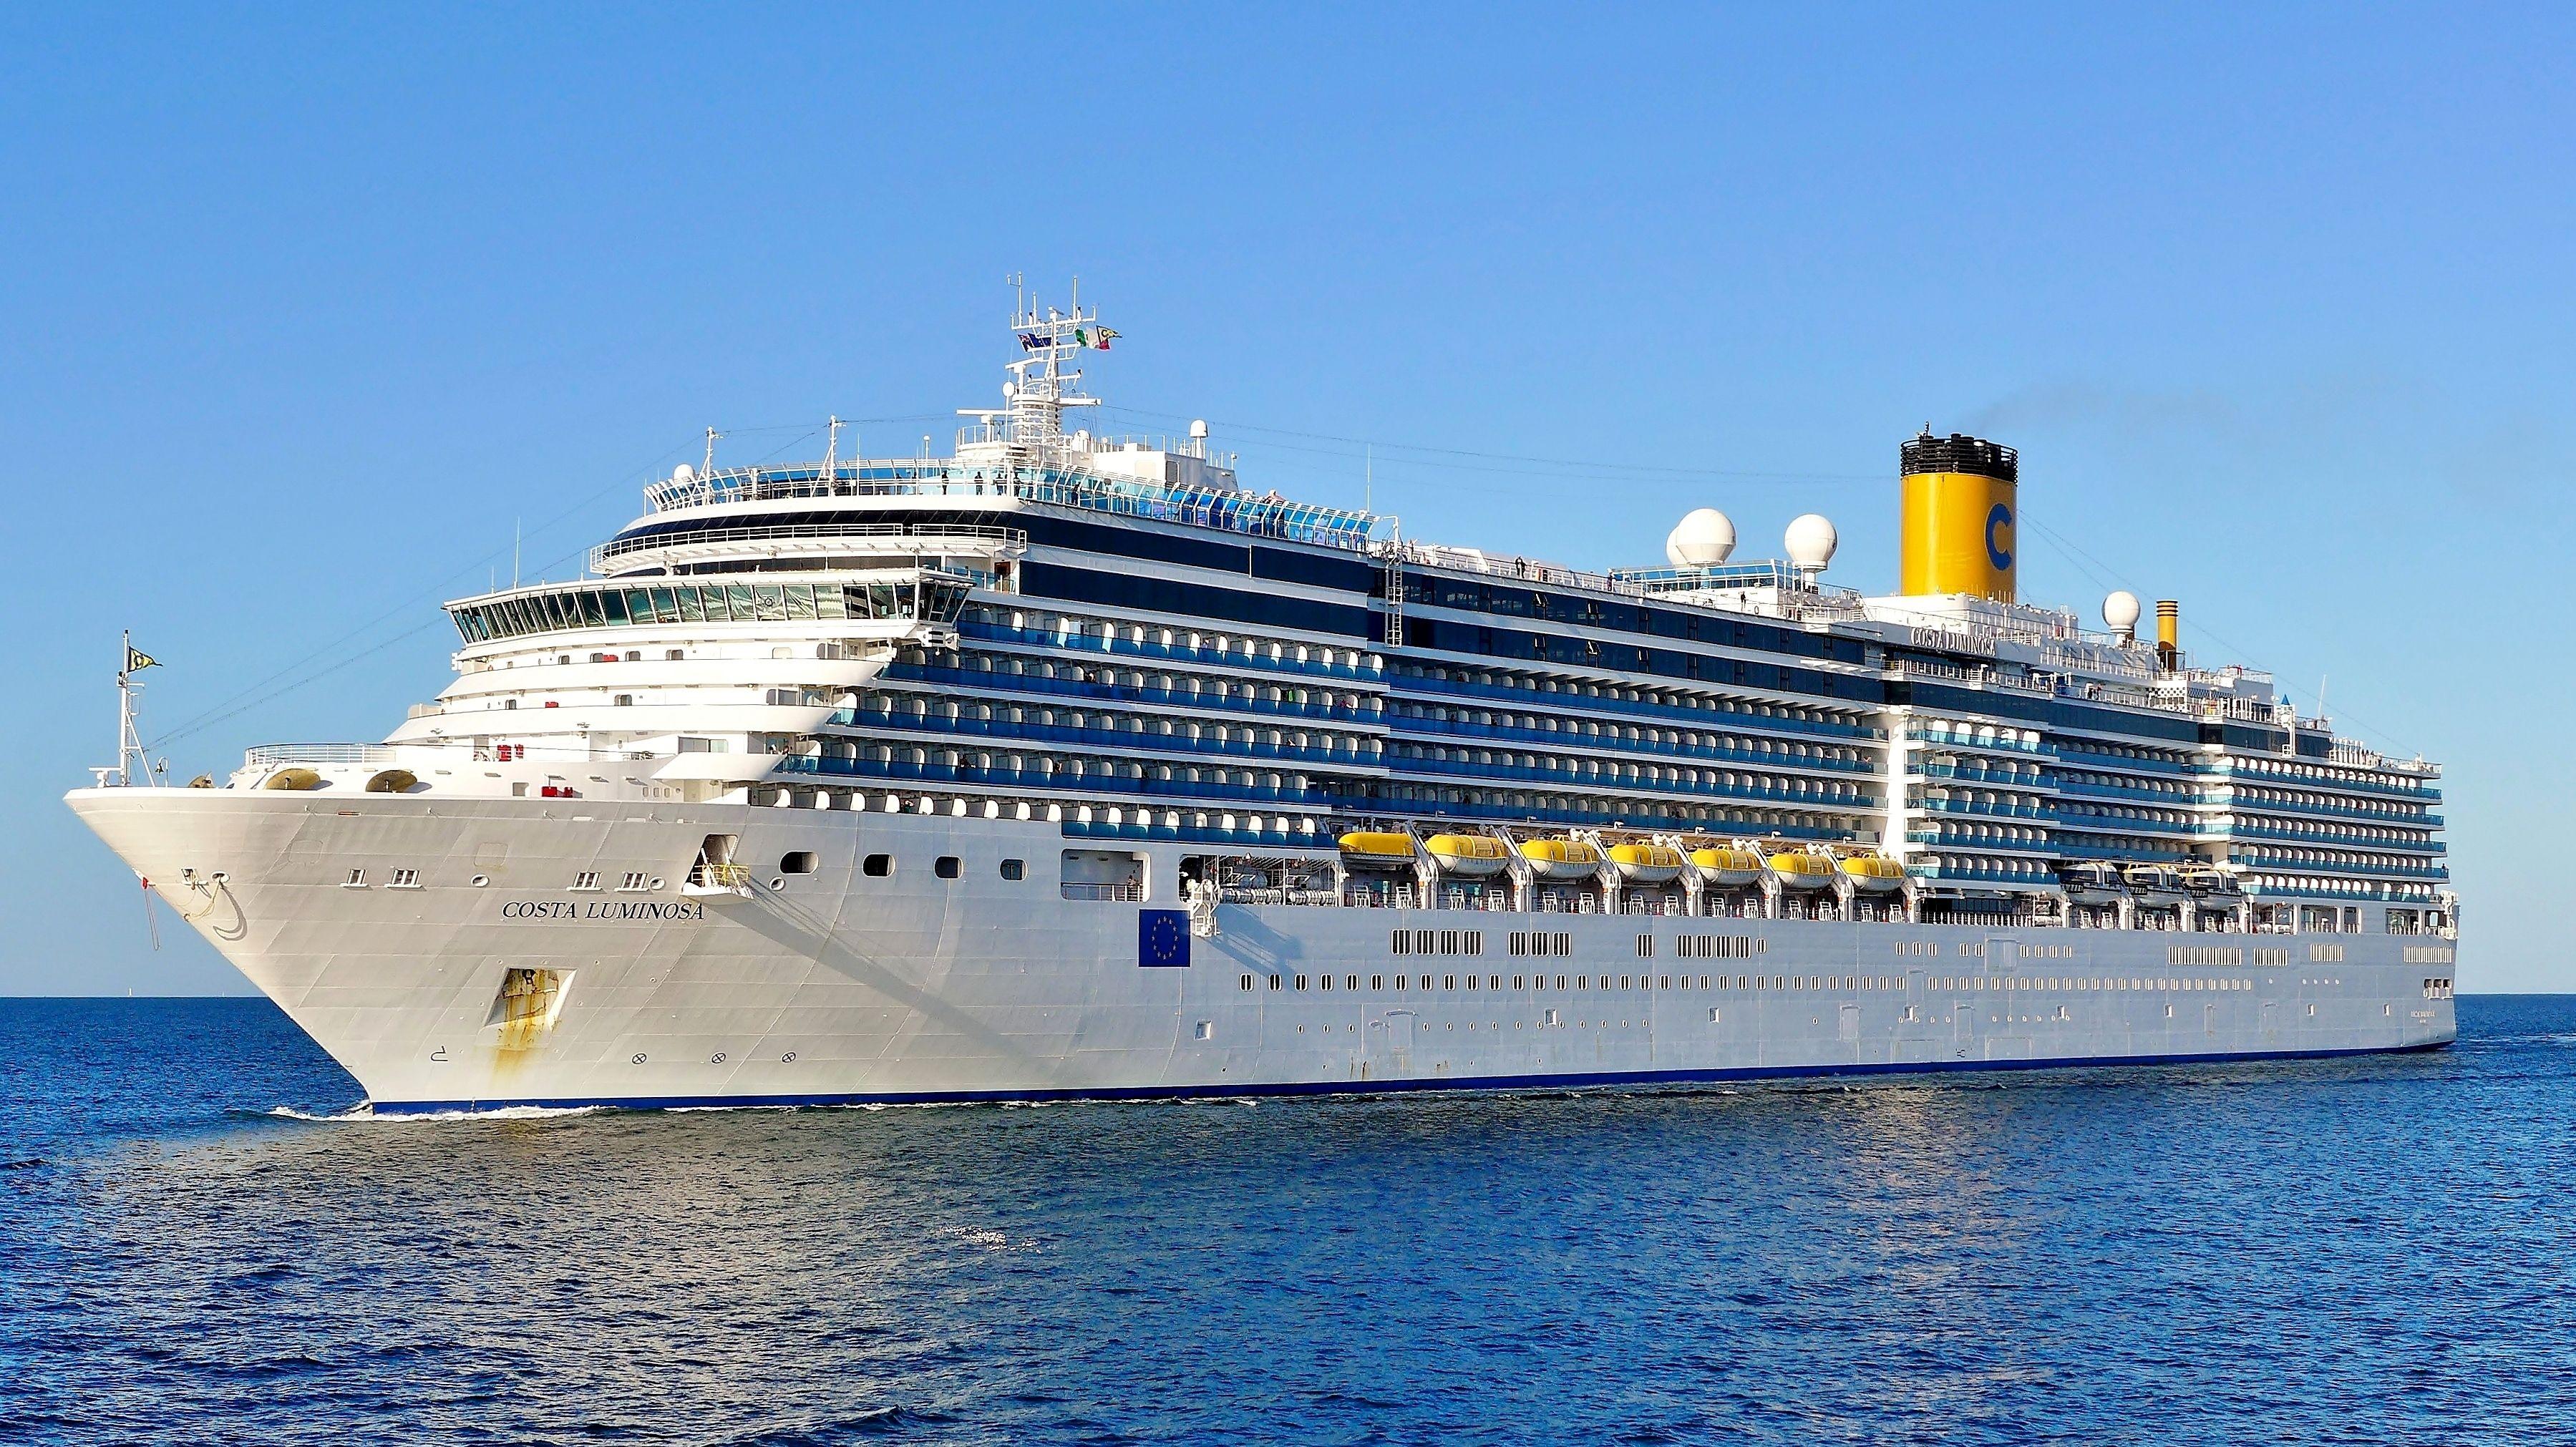 Marvellous Mediterranean Italy France Spain Balearic Islands Cruise Costa Cruises Ship Name Costa Dia Cruise Ship Cruise Ship Names Costa Cruise Ships